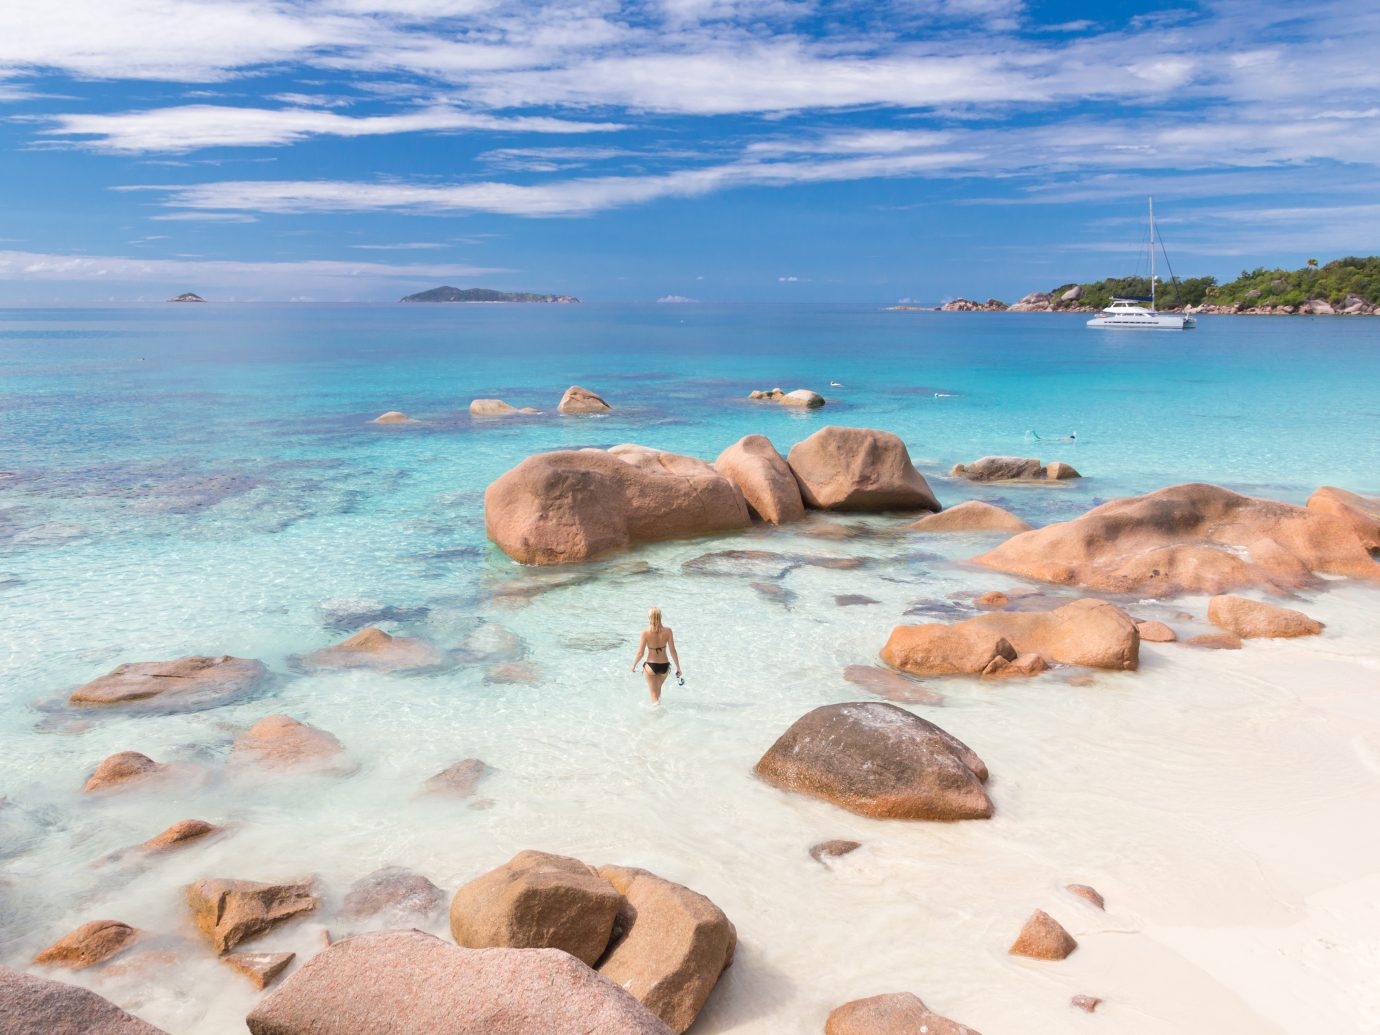 4 Anse Lazio, Prasilin Island, Seychelles, Woman wearing stylish bikini enjoying swimming and snorkeling at amazing Anse Lazio beach on Praslin Island, Seychelles. Summer vacations on picture perfect tropical beach concept.